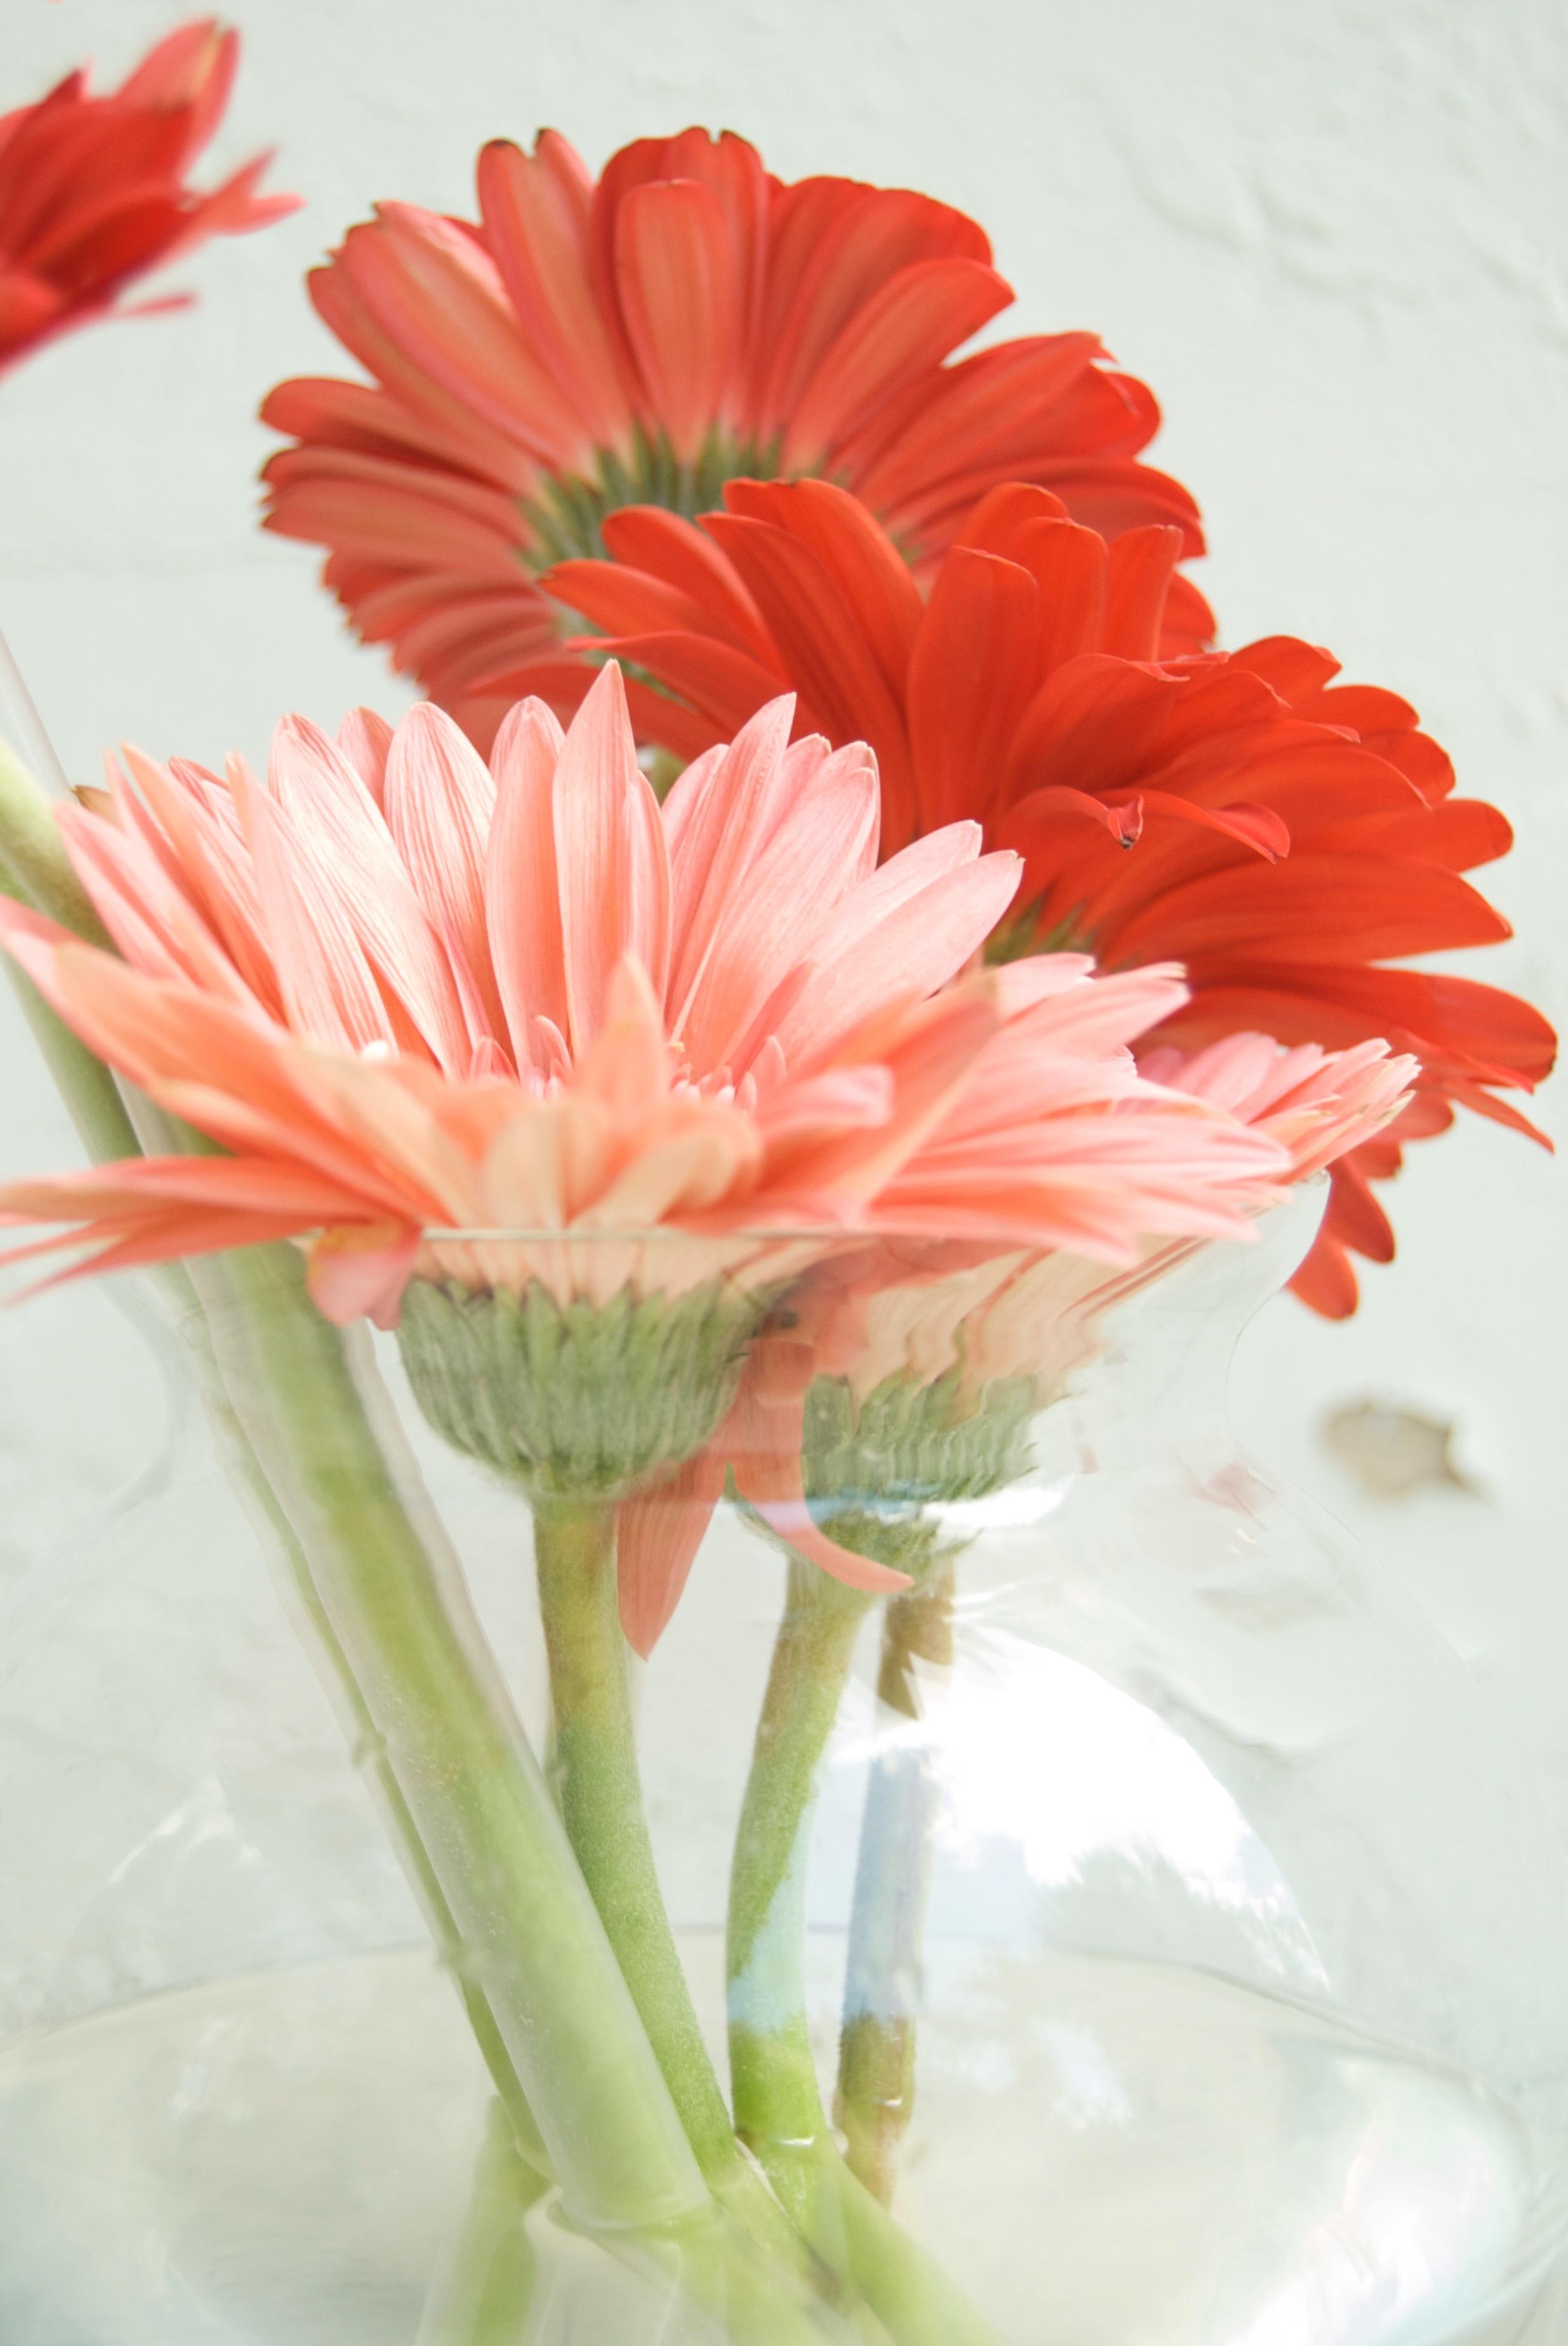 Fotos gratis flor p talo gerbera florister a planta - Cortar hierba alta ...